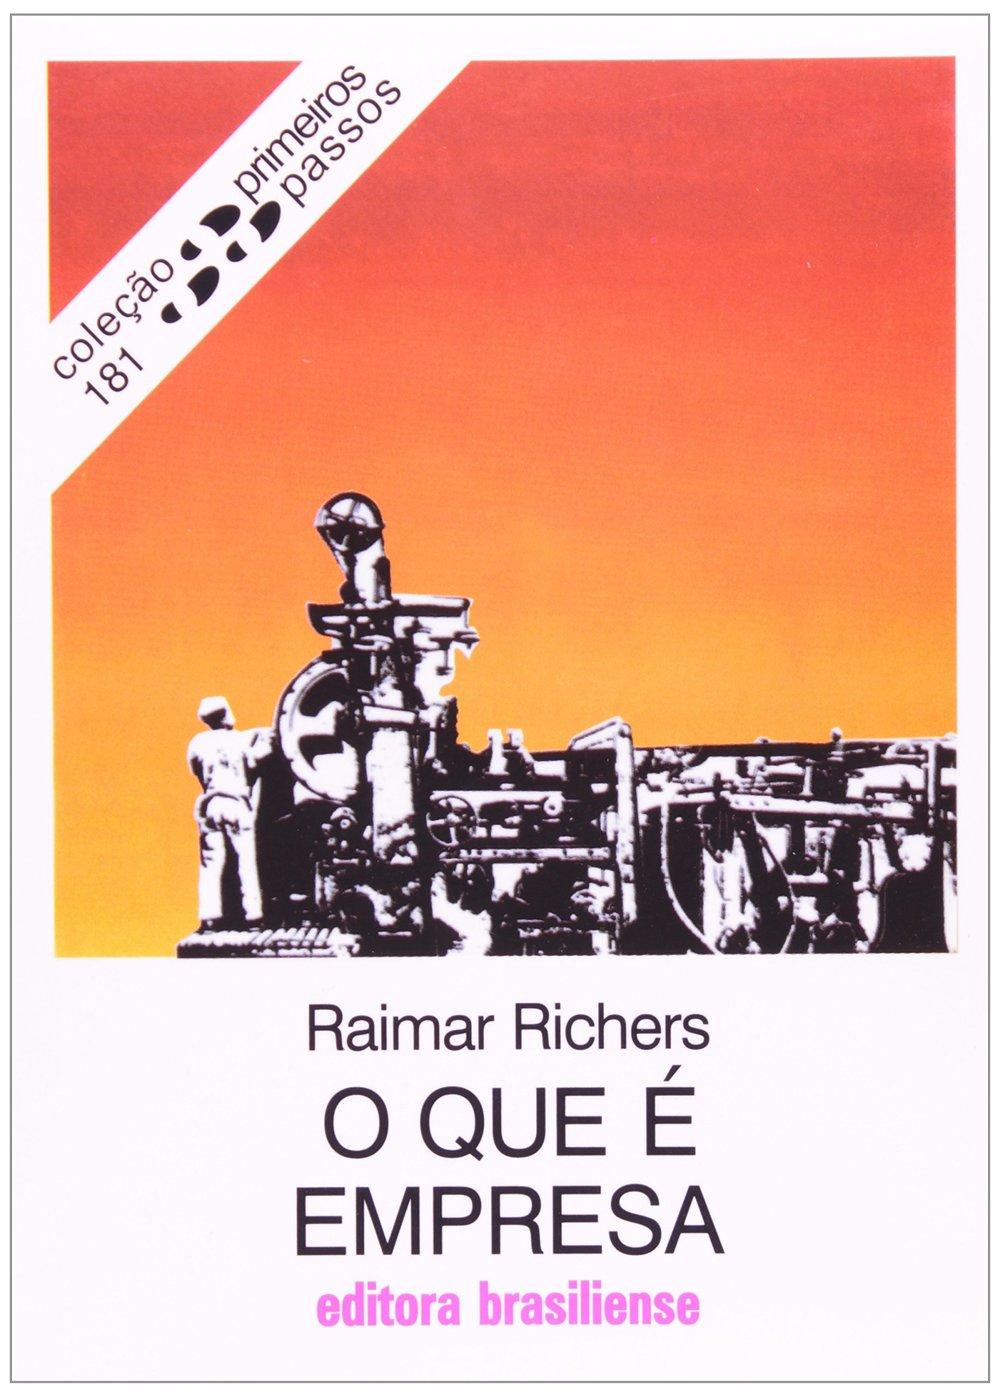 raimar_richers.jpg